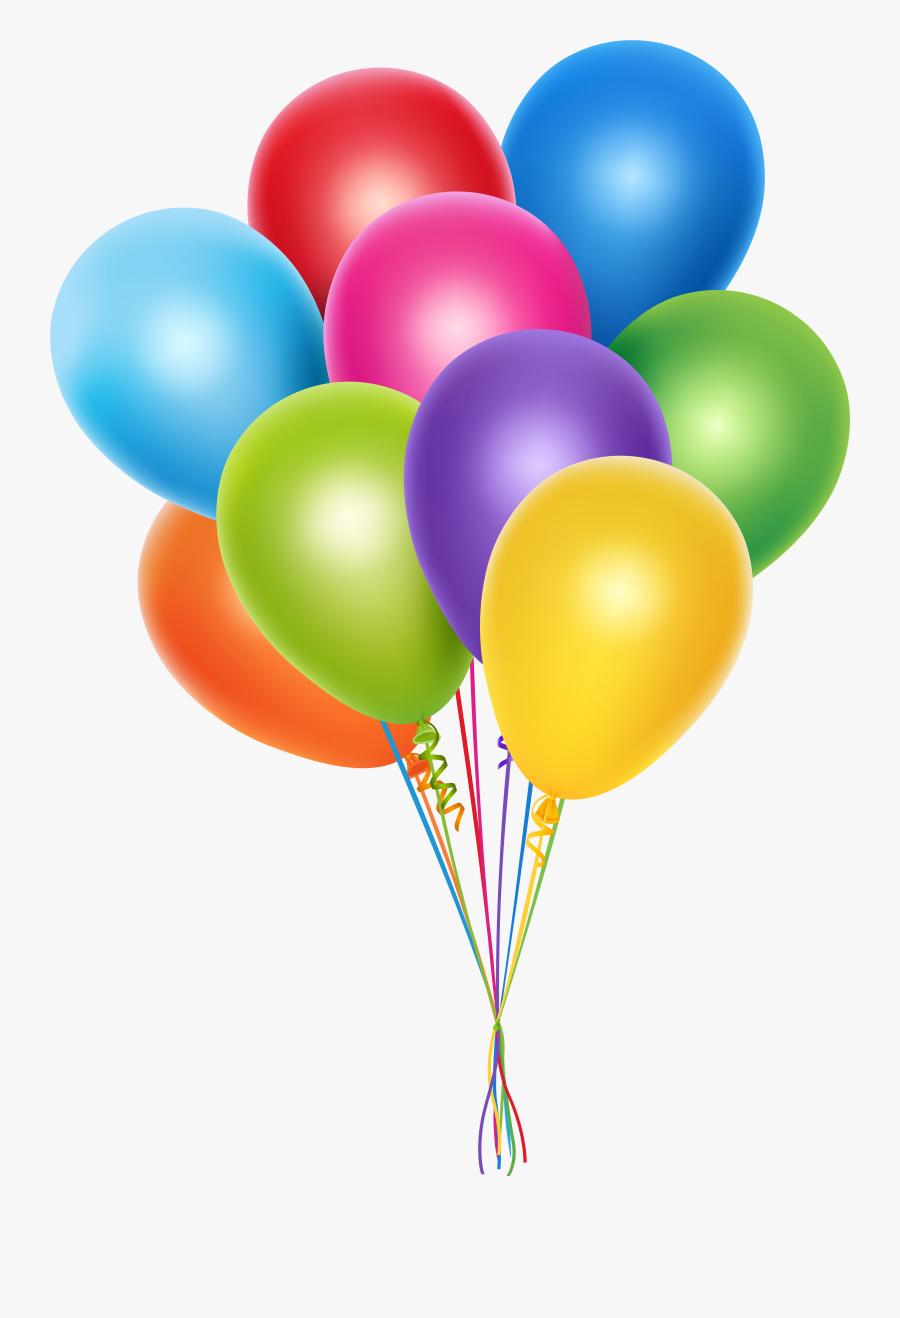 Balloon Clipart Bunch - Bunch Of Balloons Clipart, Transparent Clipart